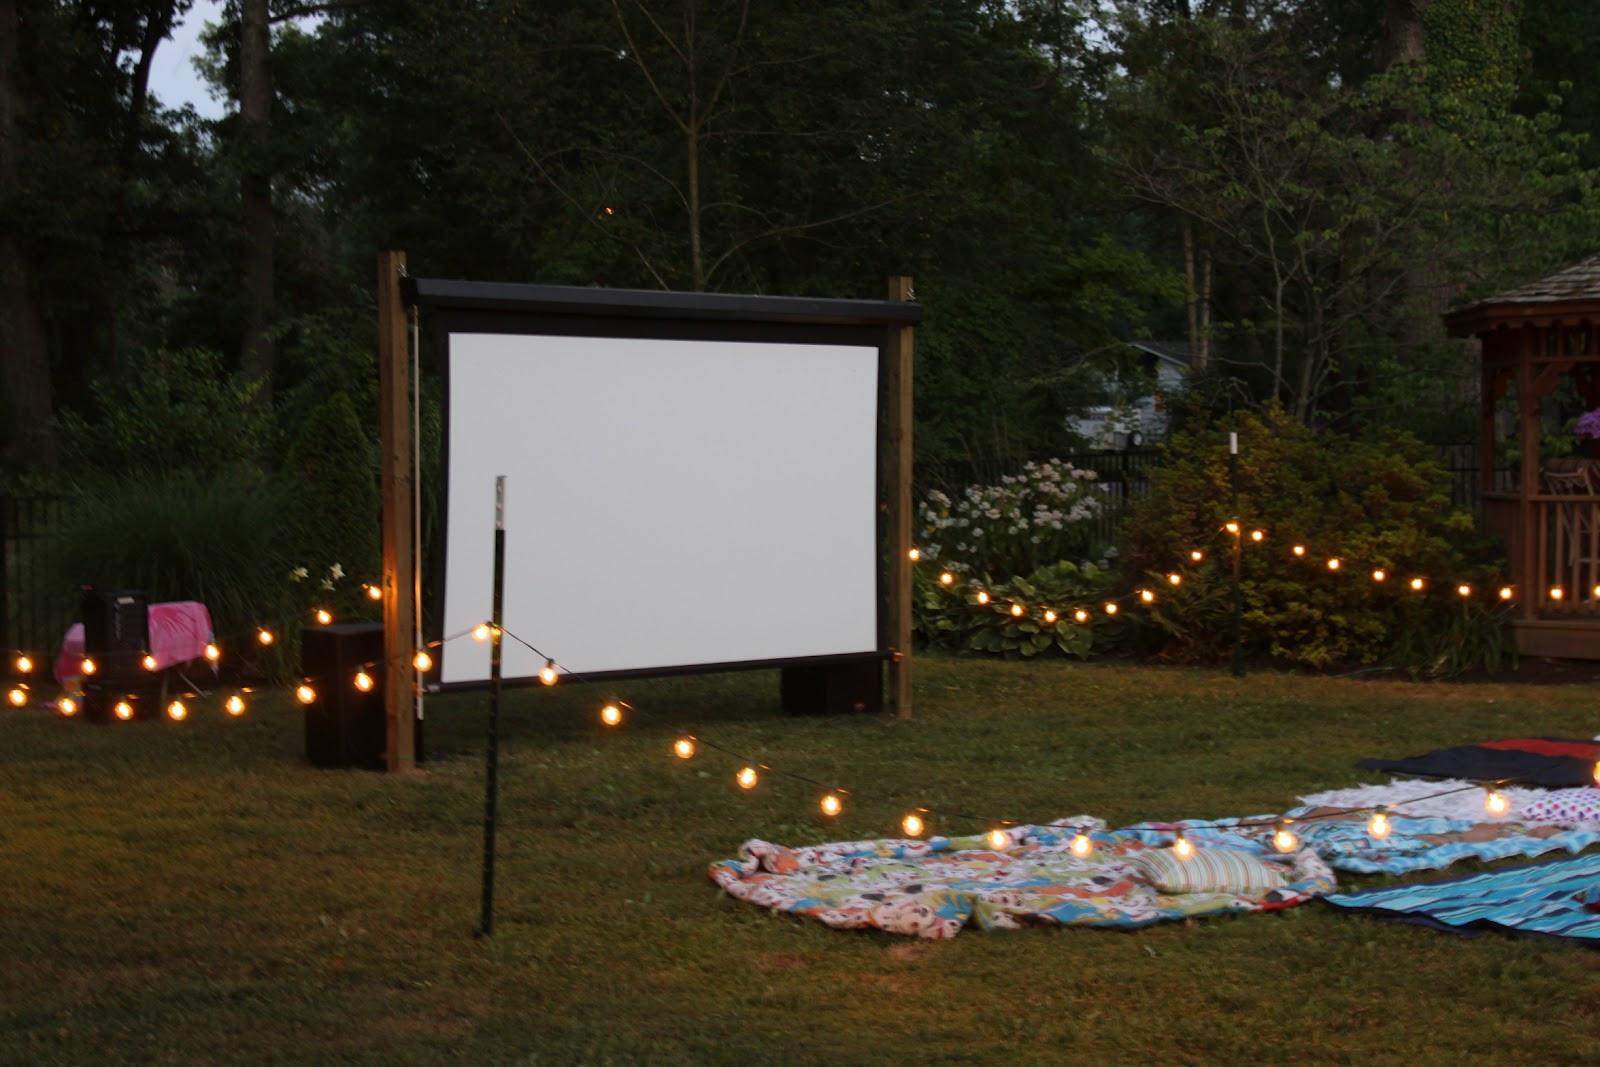 Outdoor Movie Screen DIY  Easy DIY Outdoor Cinema Will Make Your Yard The Ultimate